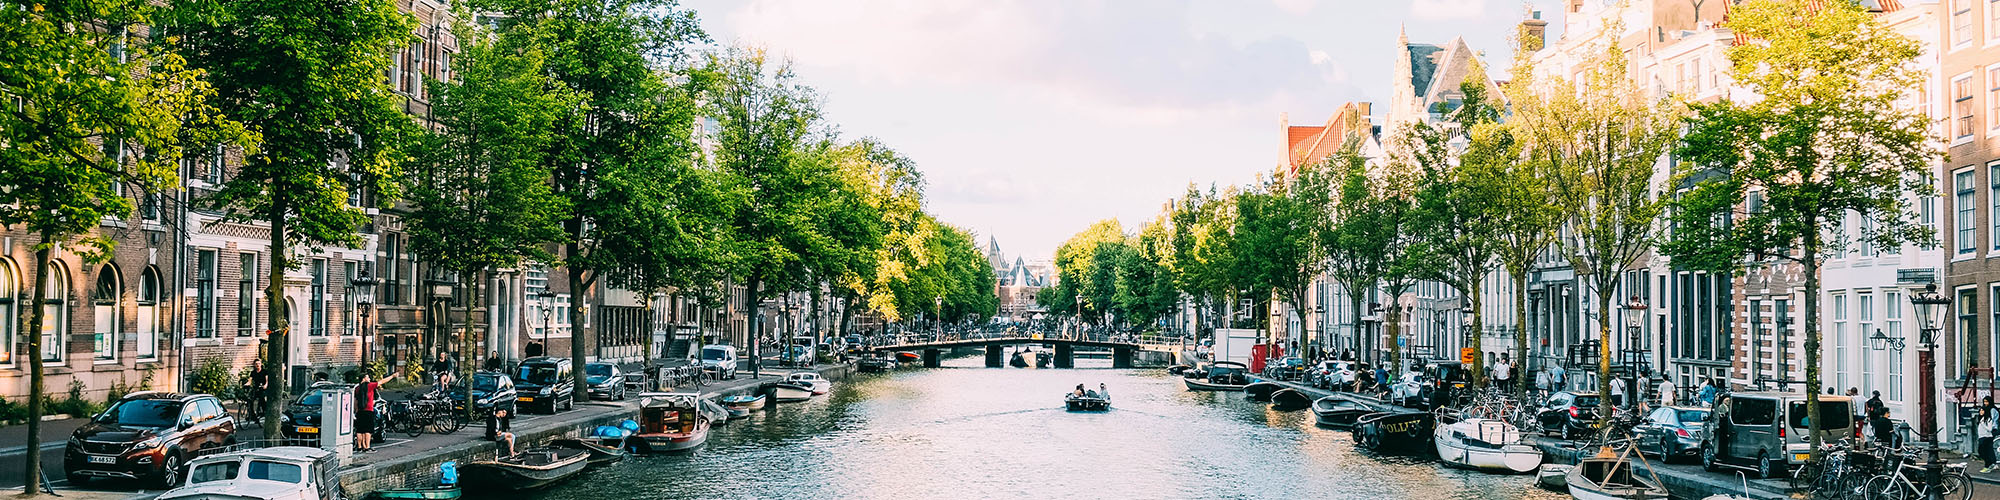 Uniek overnachten in Nederland